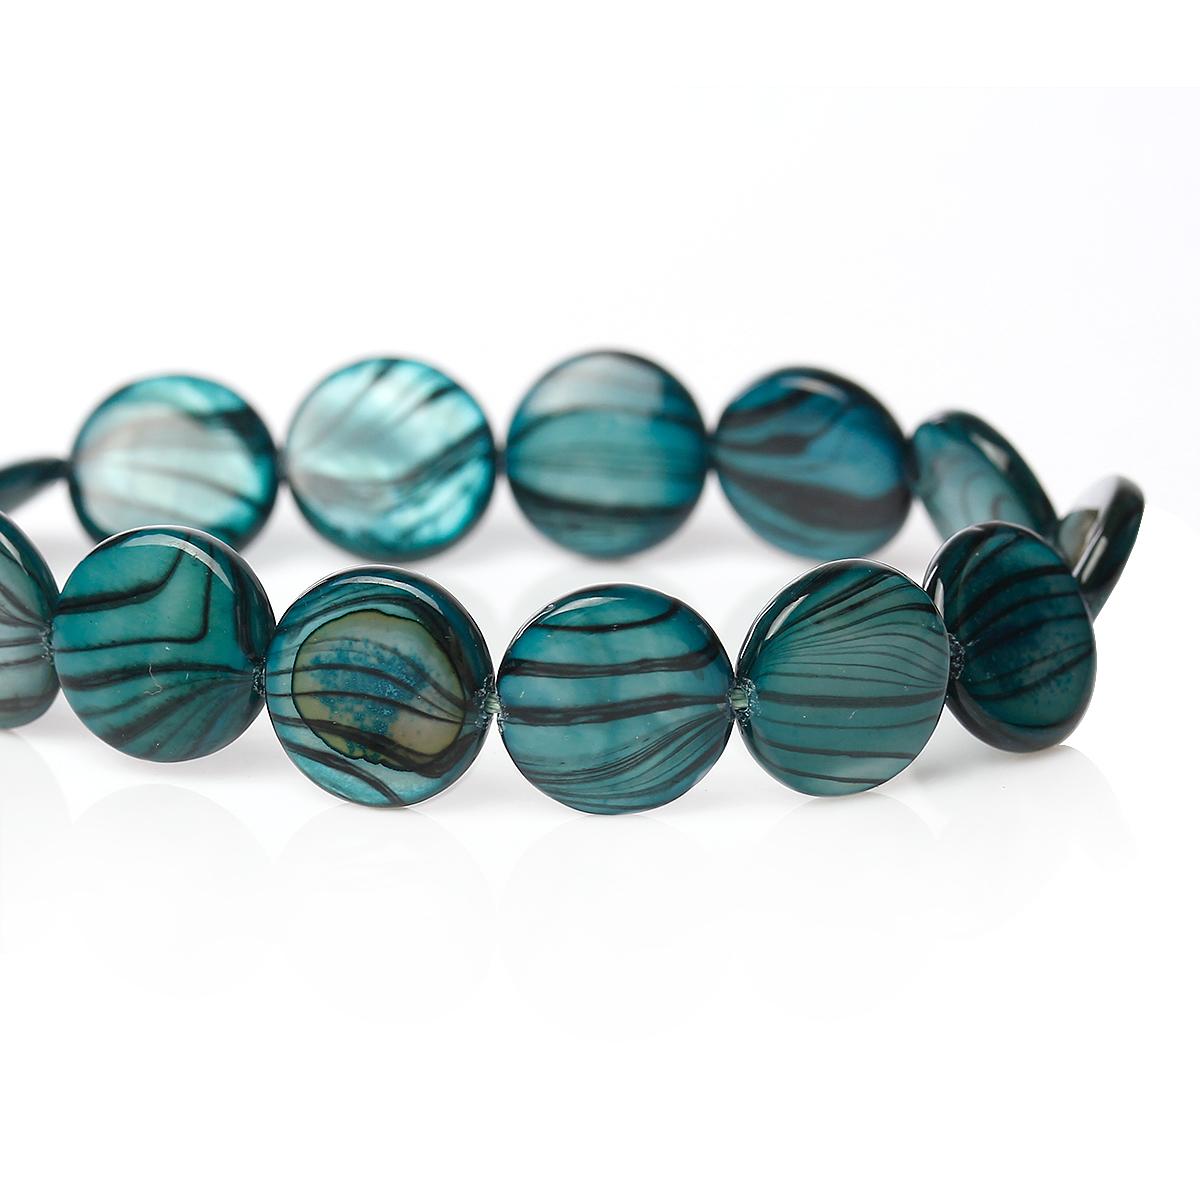 Lot de 8 Perles nacres palet 10mm kaki vert paon  zébré noir